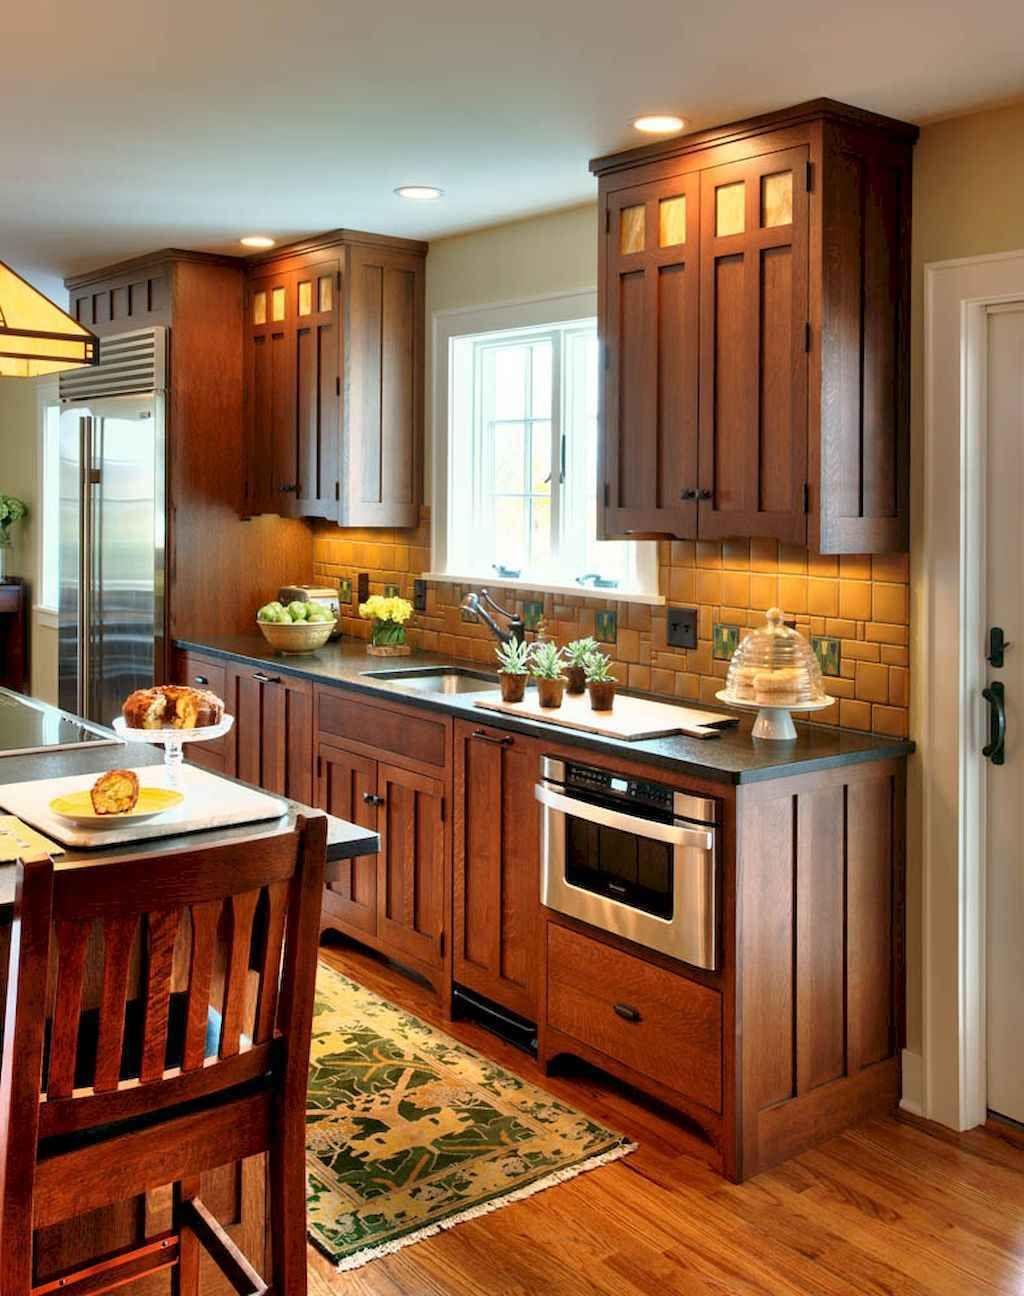 100 Best Oak Kitchen Cabinets Ideas Decoration For Farmhouse Style 3 Craftsman Style Kitchens Craftsman Kitchen Rustic Kitchen Cabinets